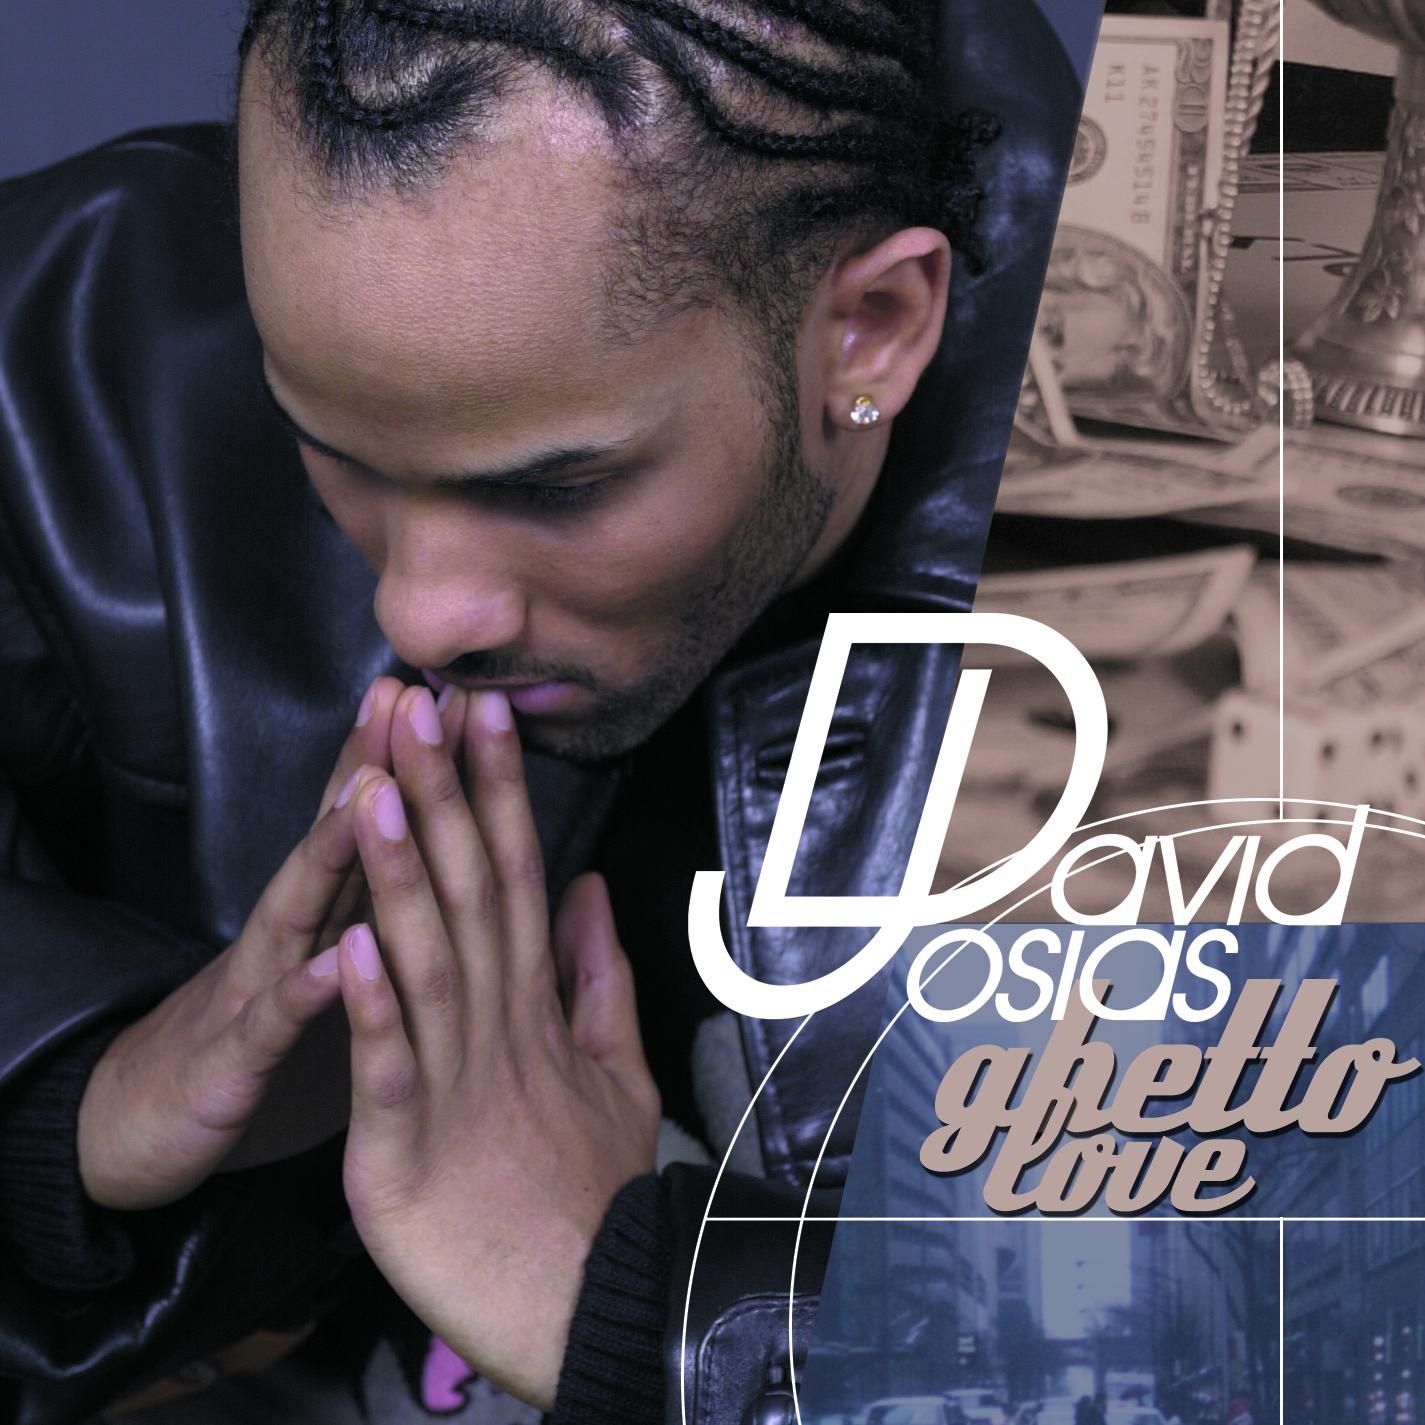 David Josias_Ghetto Love_Large CD scan.jpg